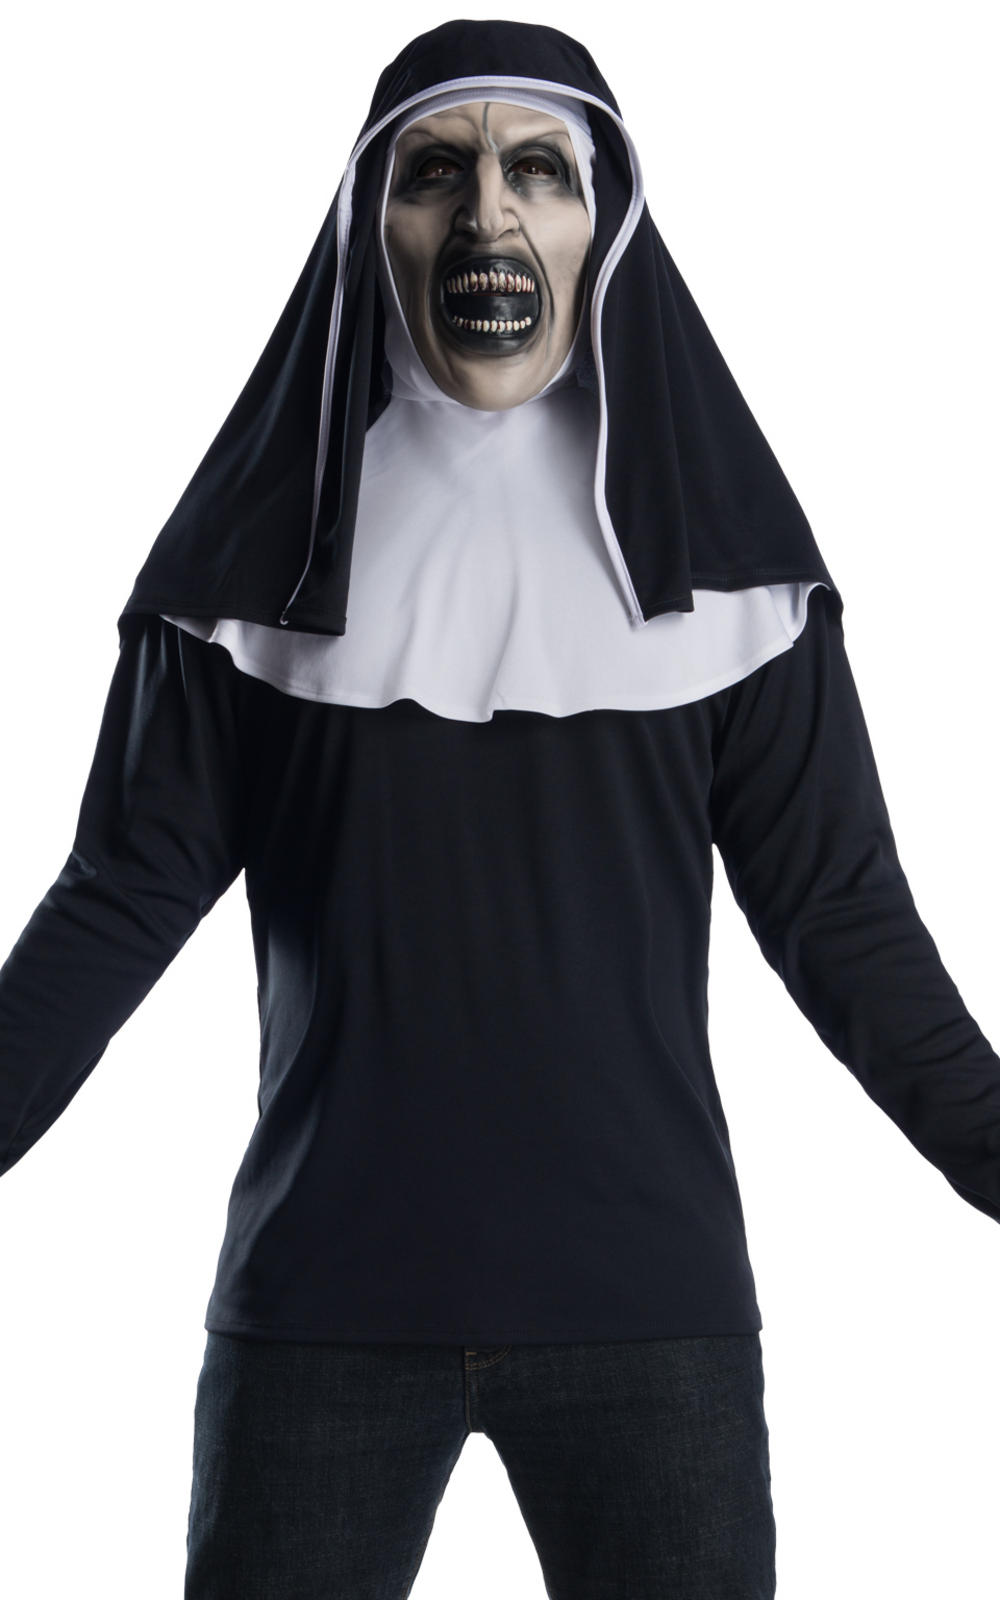 The Nun Adult Costume